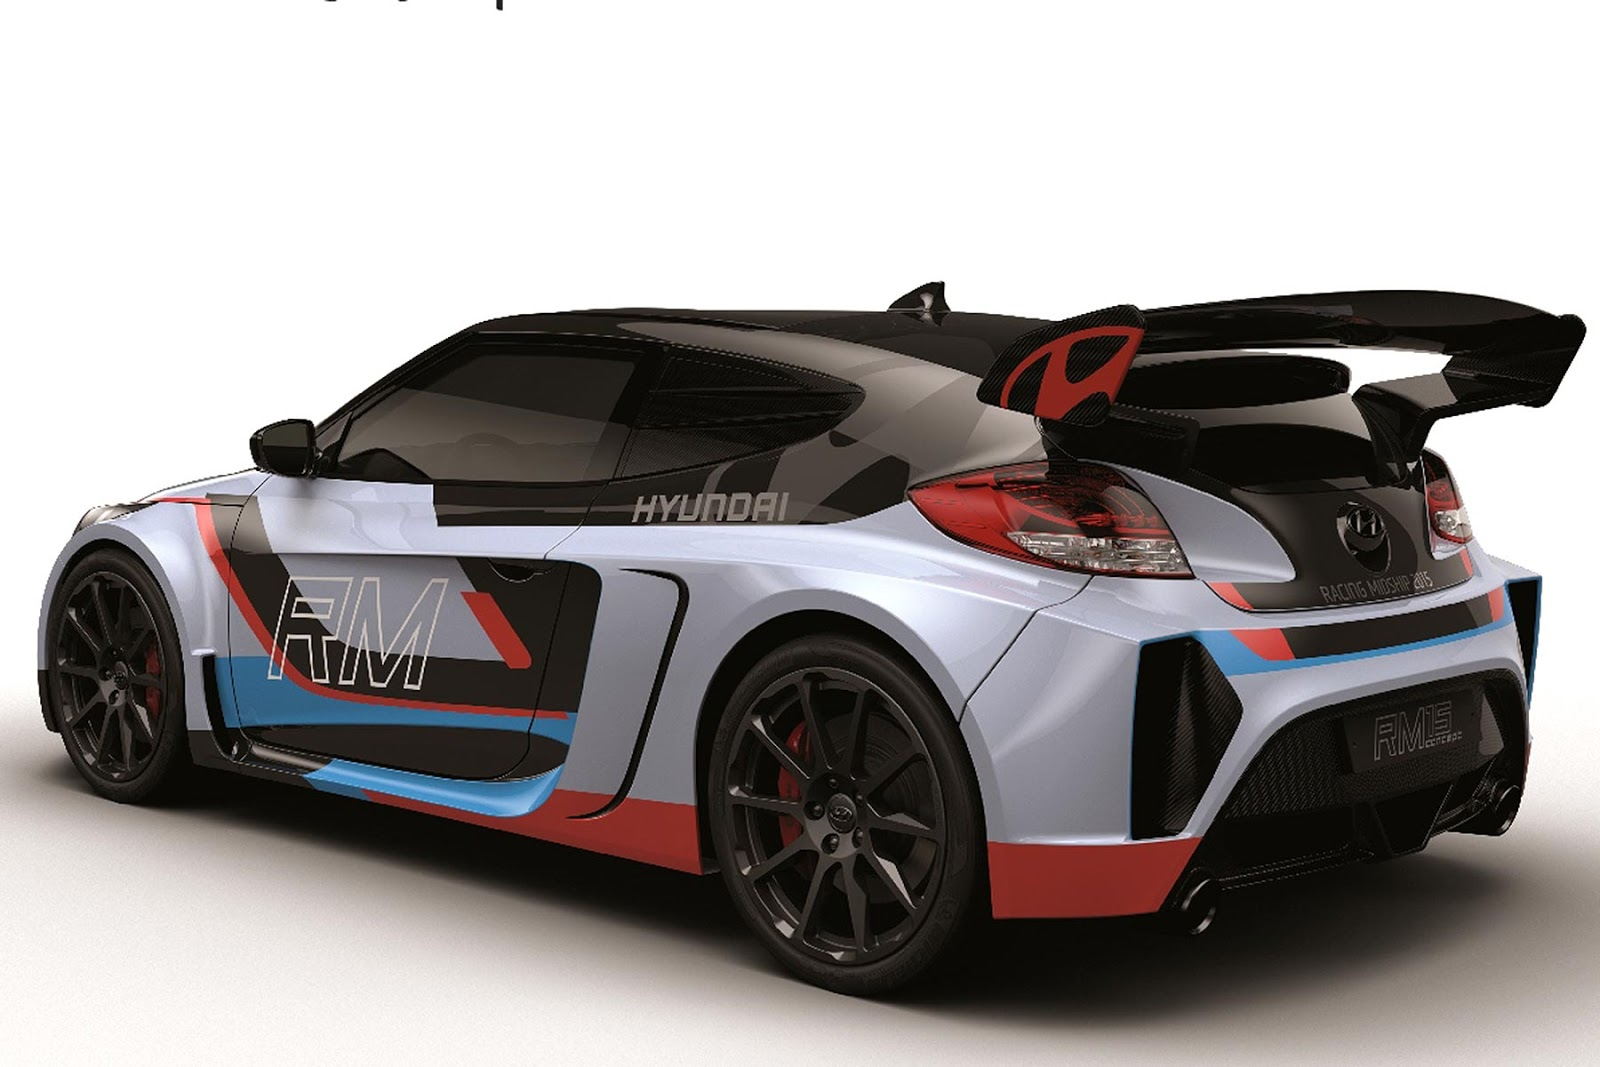 hrm2 Έρχονται Tucson, Kona, i20 N και κεντρομήχανο πισωκίνητο Hyundai! Hyundai, Hyundai i20 WRC, hyundai i30n, zblog, μοντέλα, πισωκίνητο, σπορ